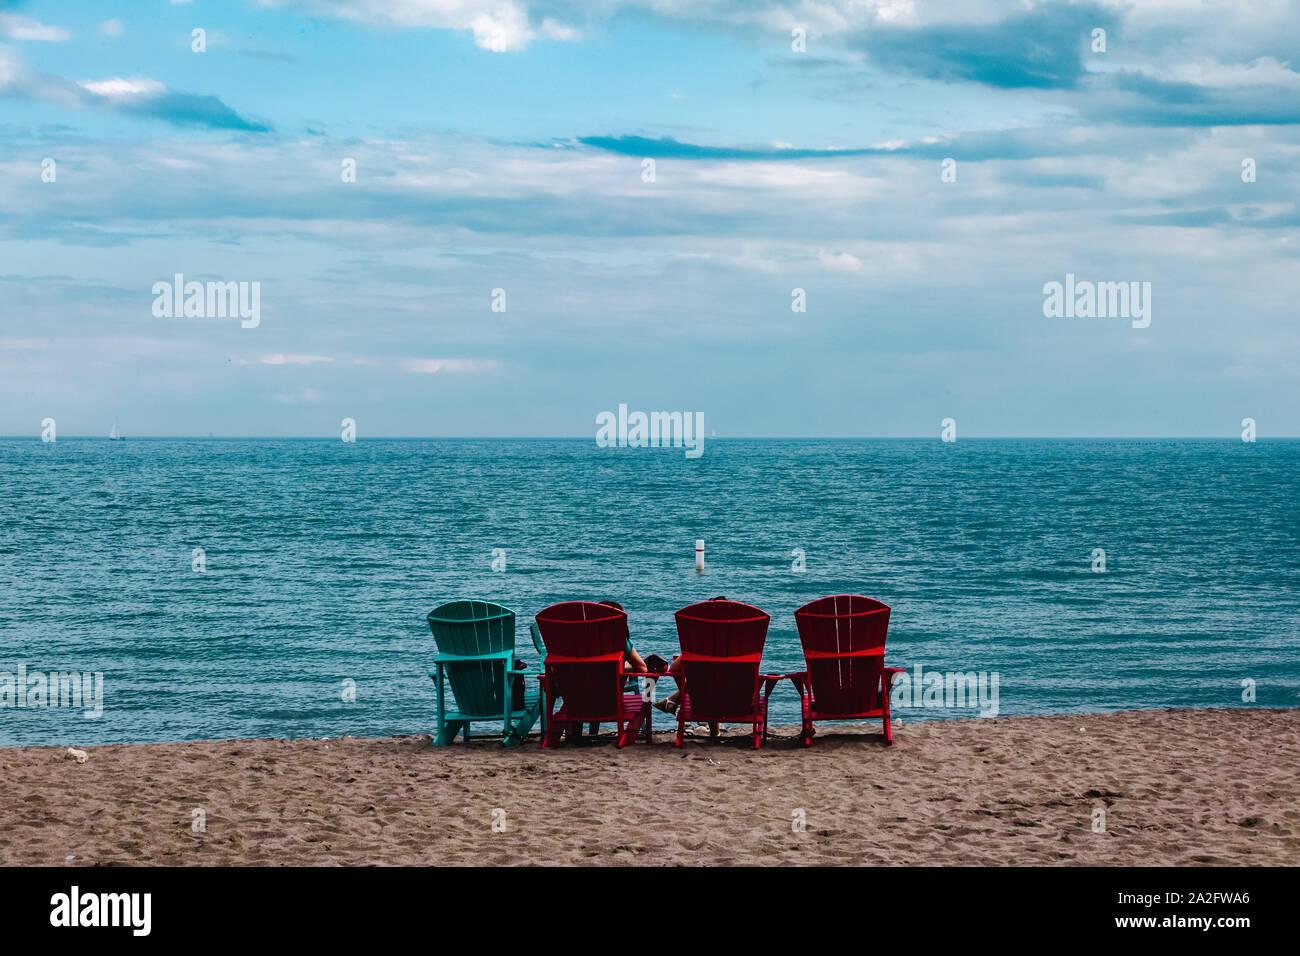 Les plages de Toronto, Ontario, Canada Banque D'Images